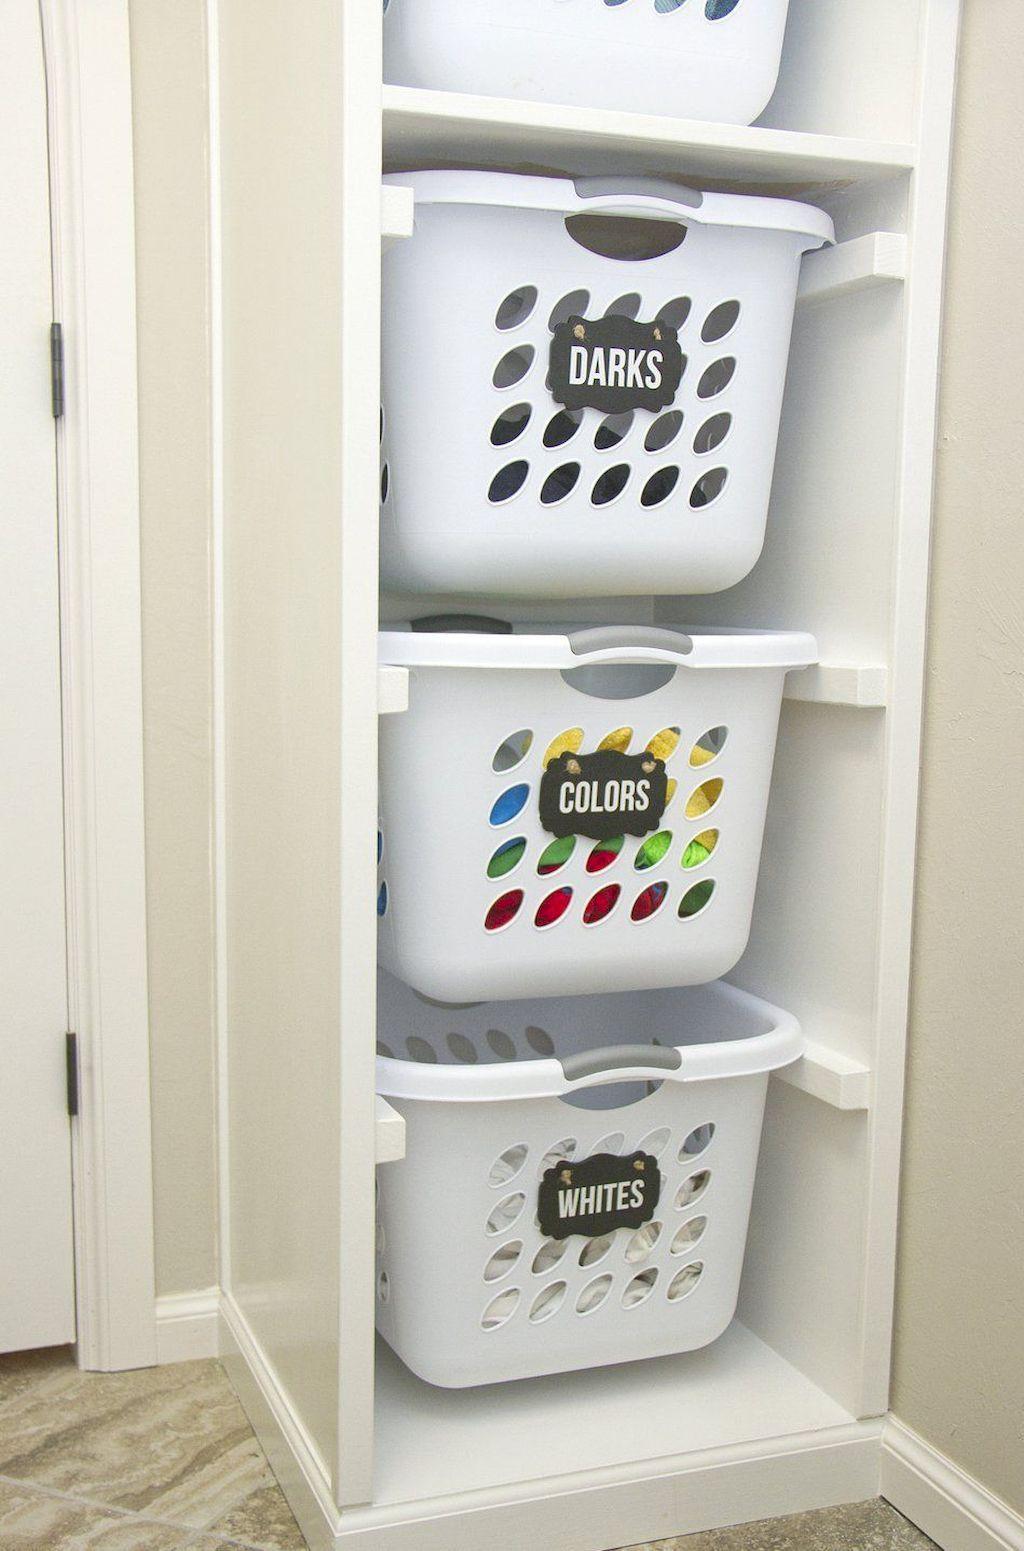 55 Smart Laundry Room Organization Ideas images